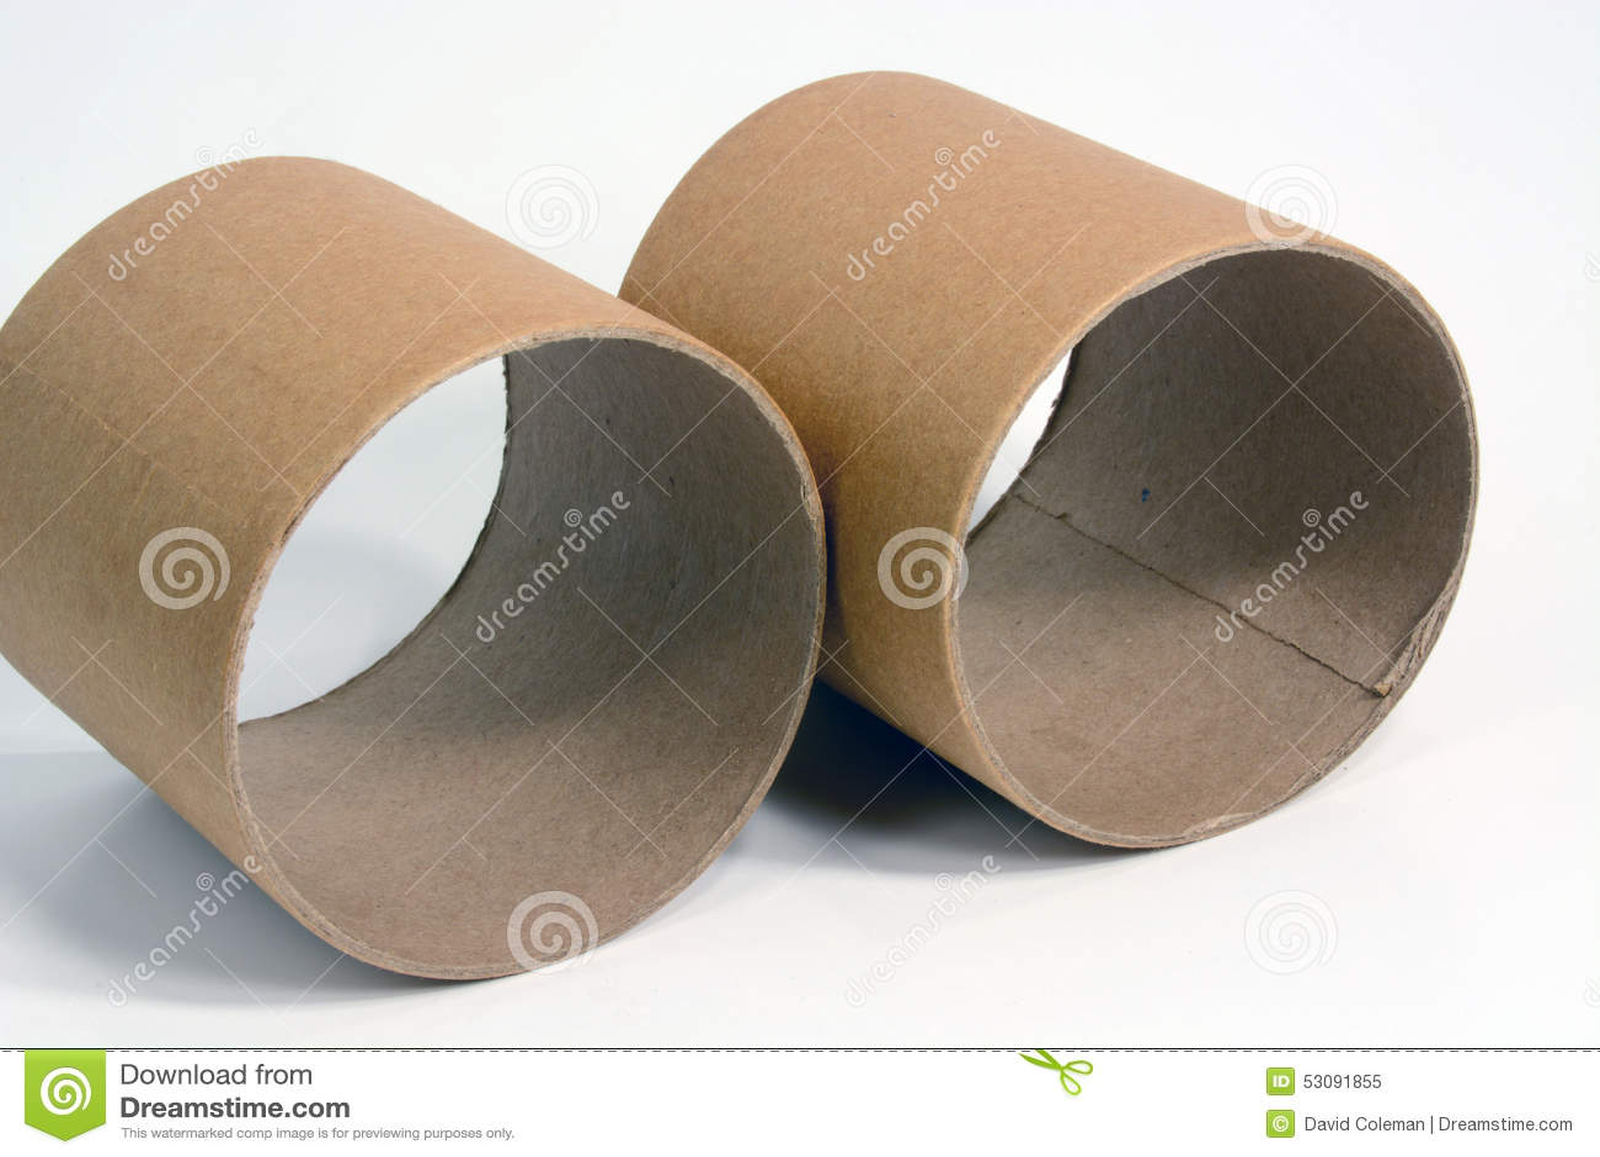 Cilindri di cartone ht25 regardsdefemmes for Tubi cartone